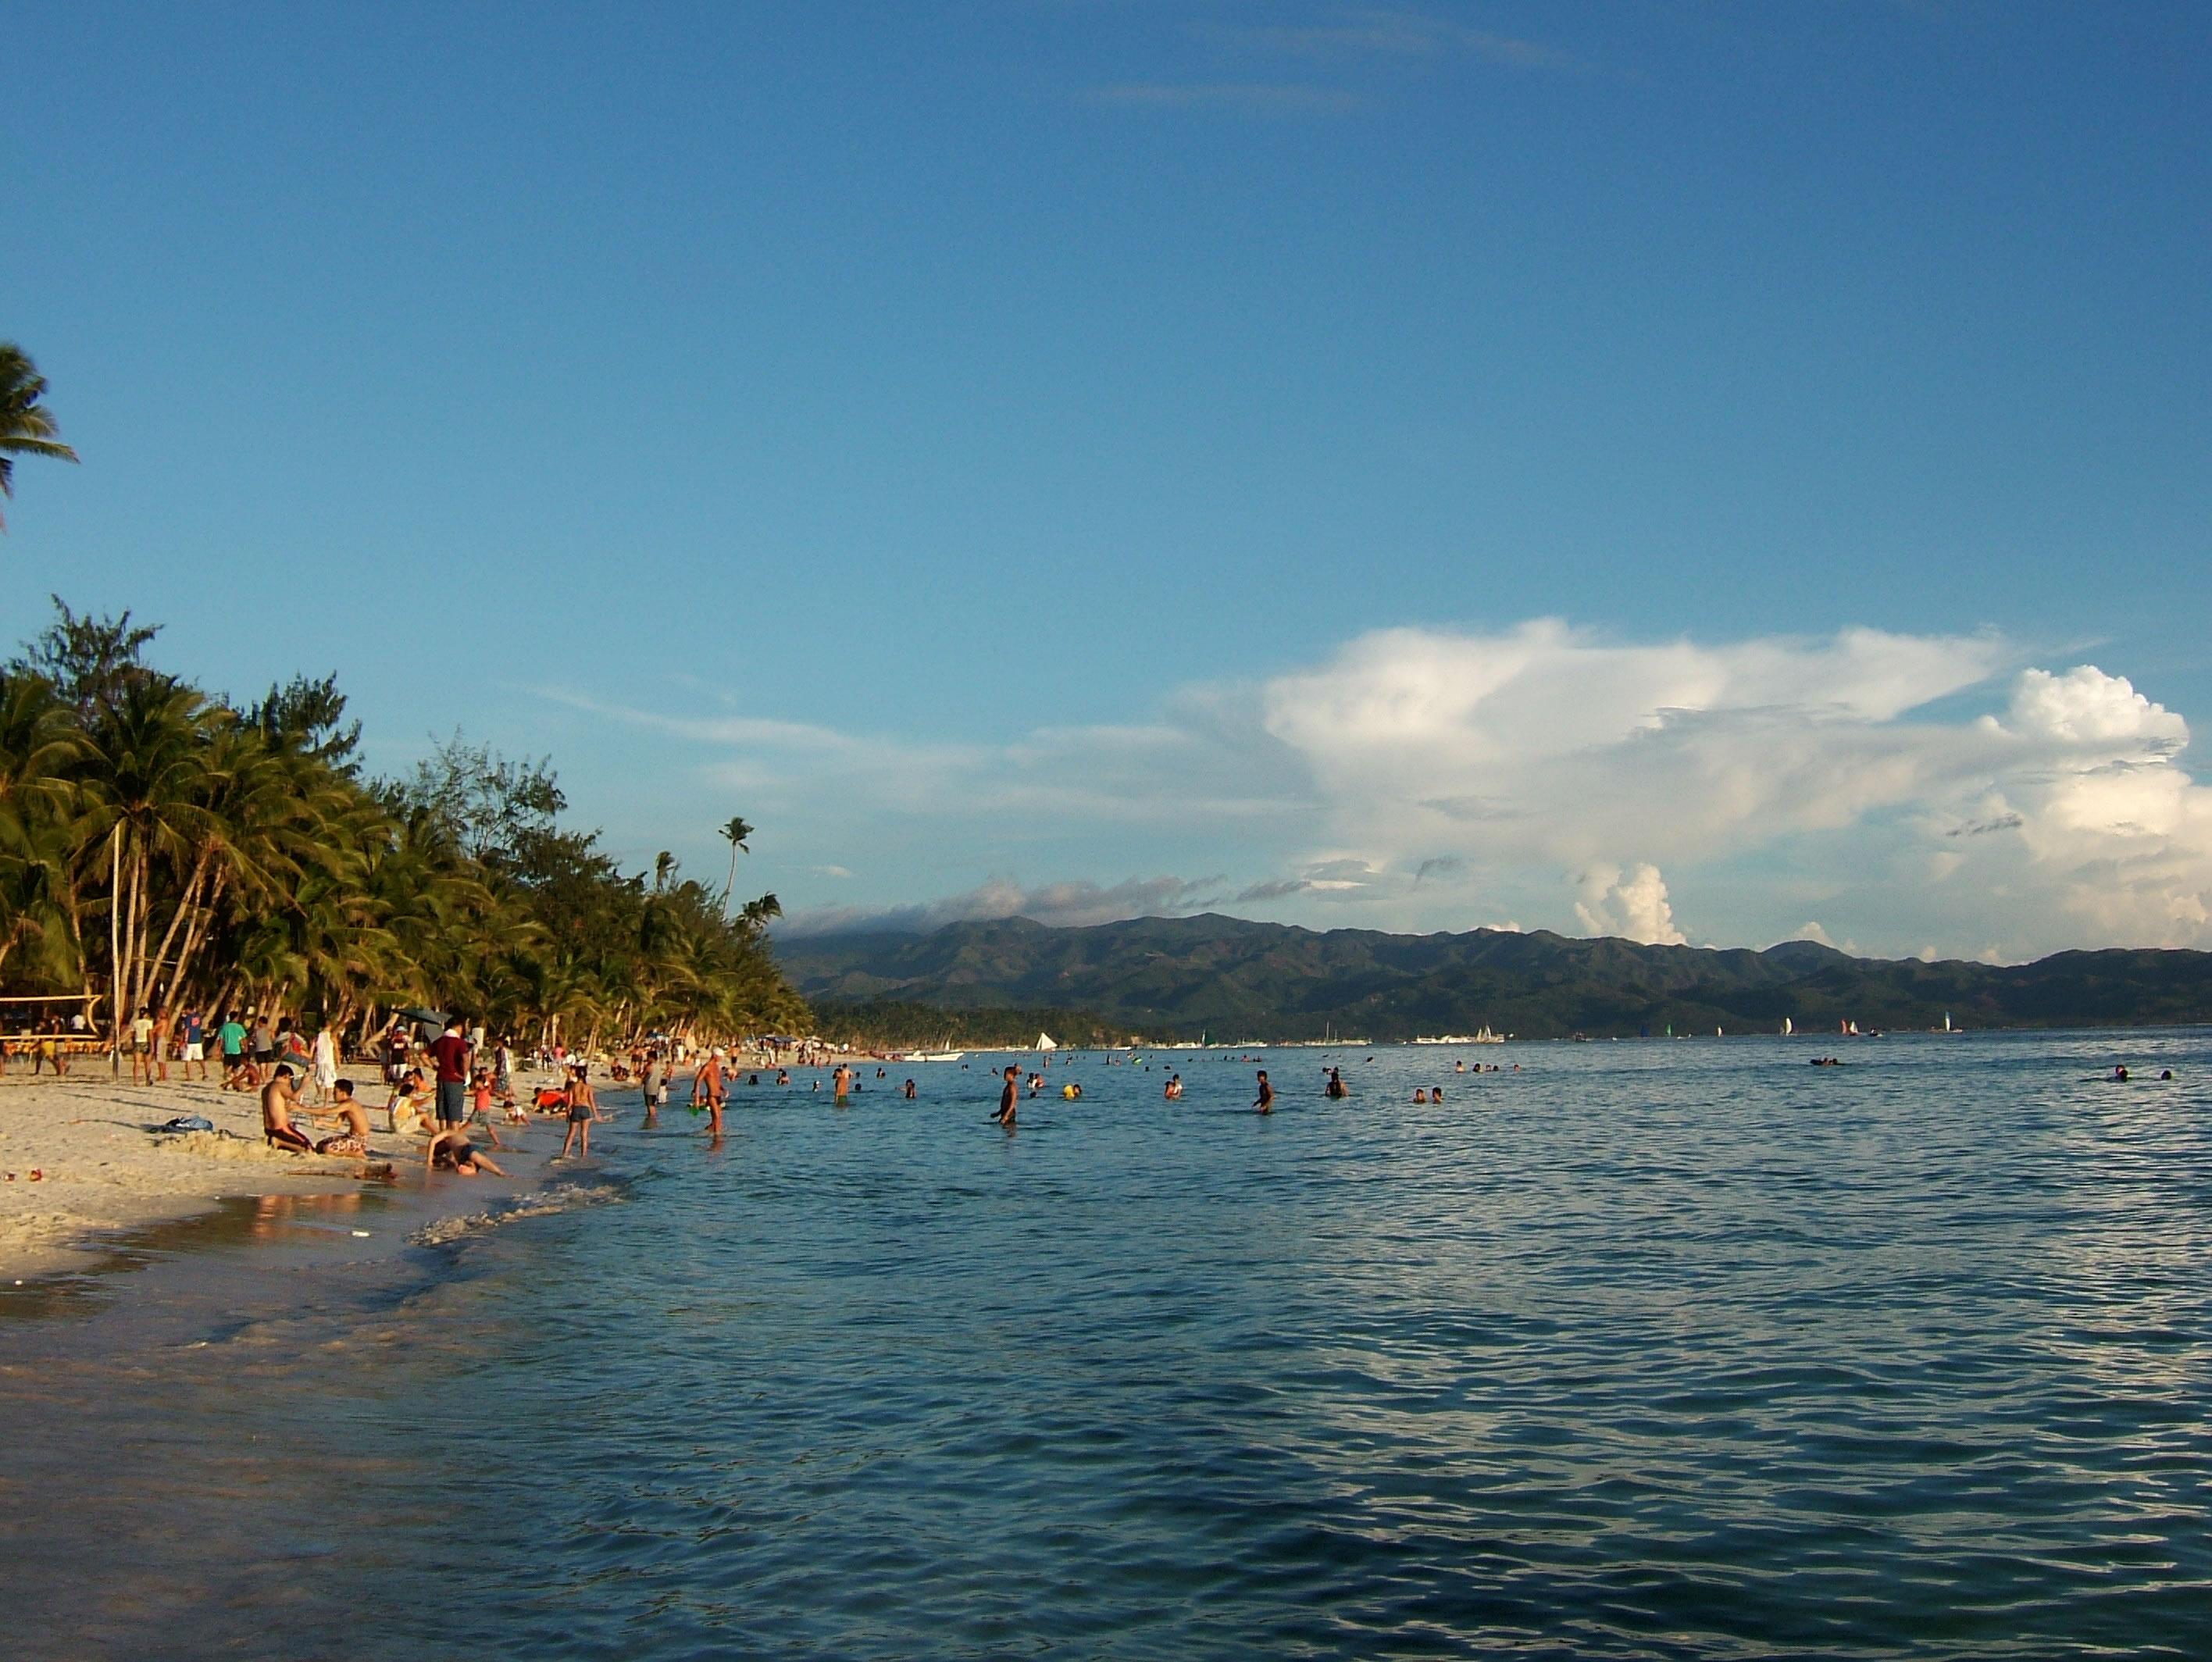 Philippines Sugar Islands Caticlan Boracay White Beach Sunset May 2007 04